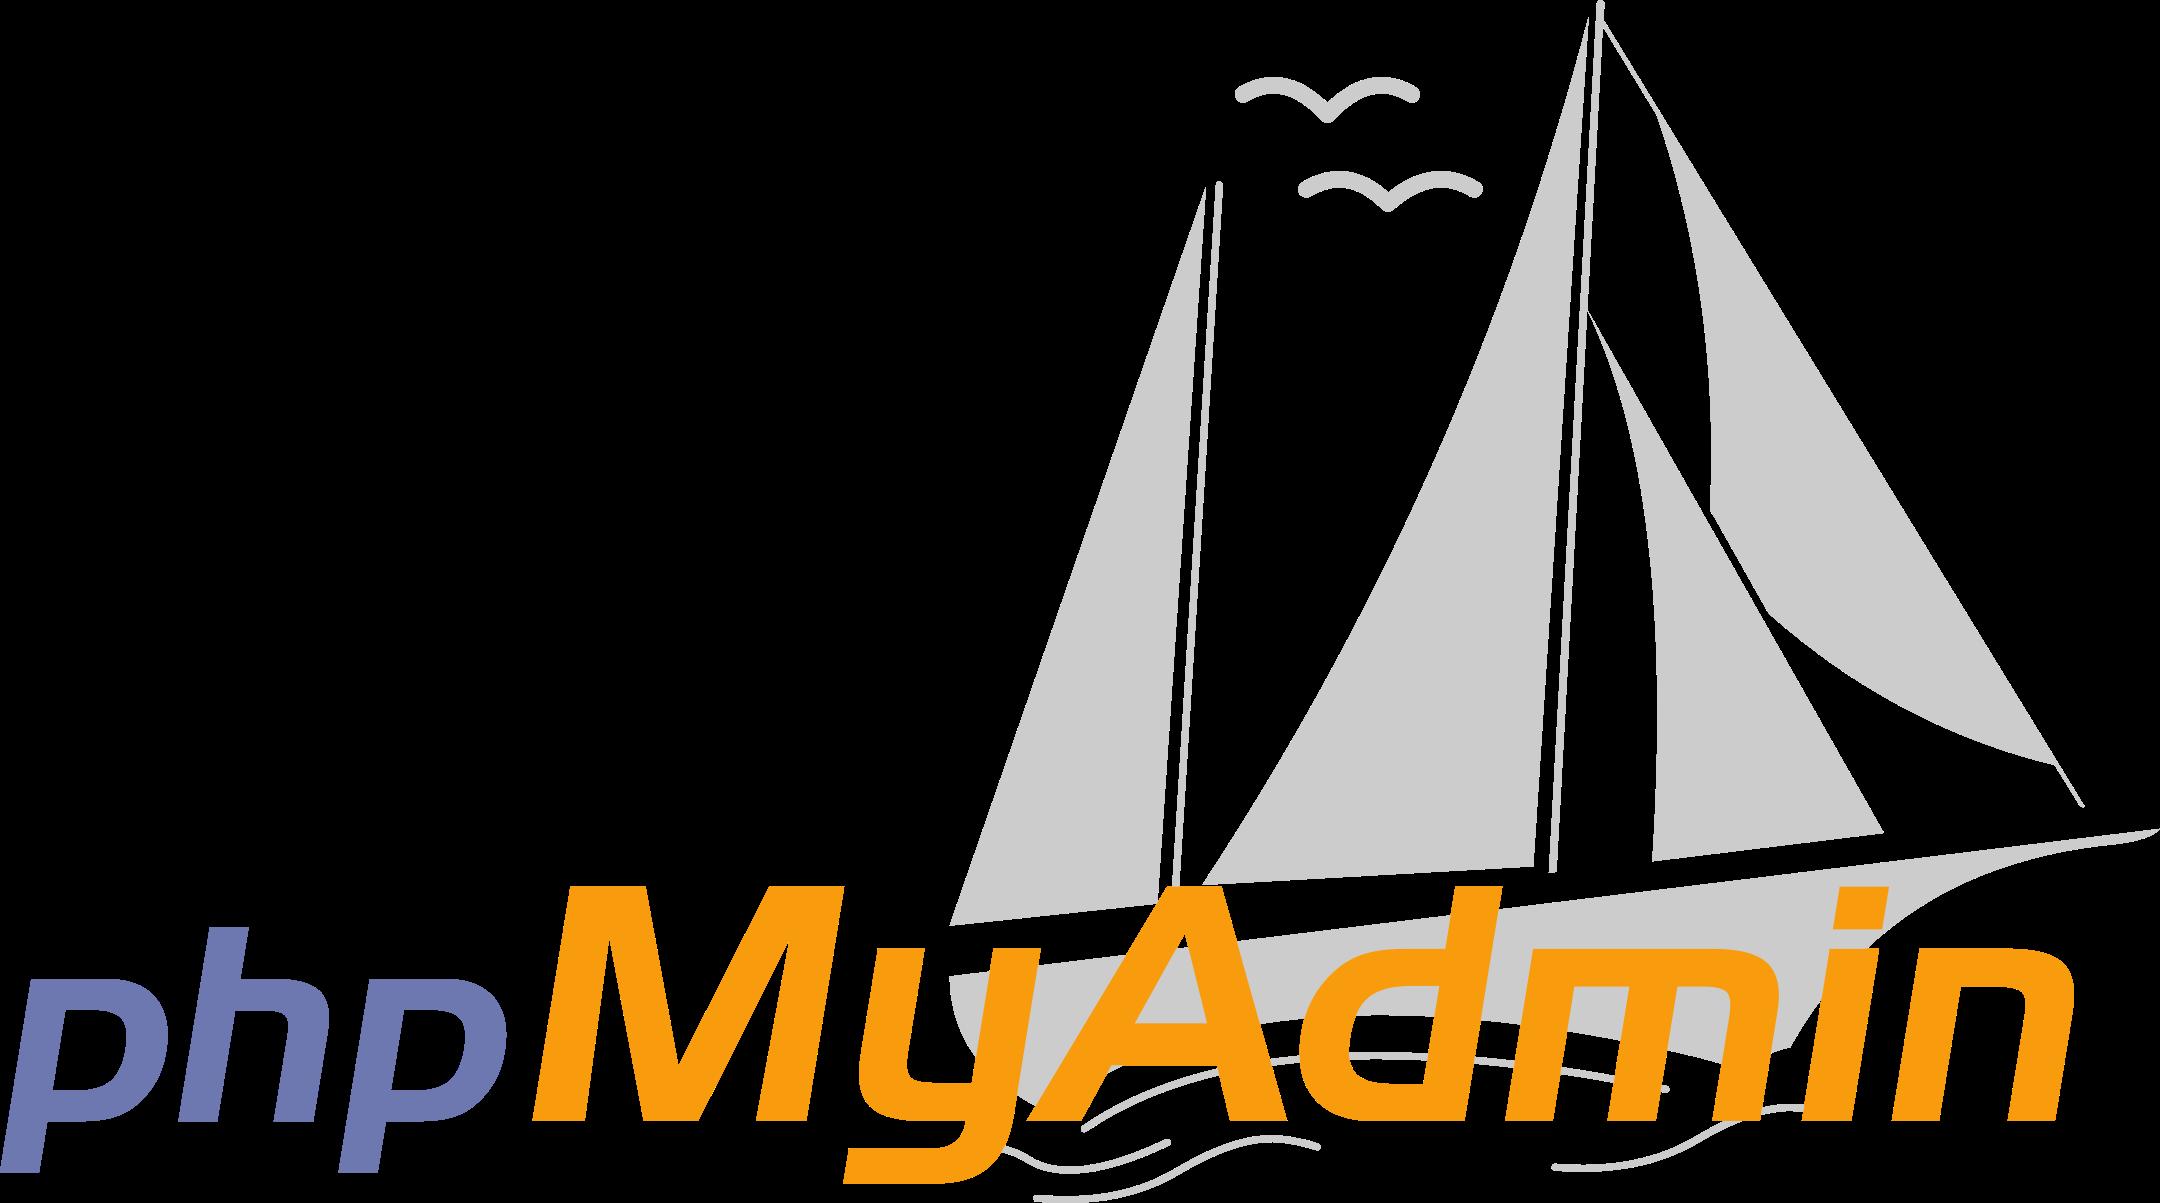 phpmyadmin logo 1 - phpMyAdmin Logo